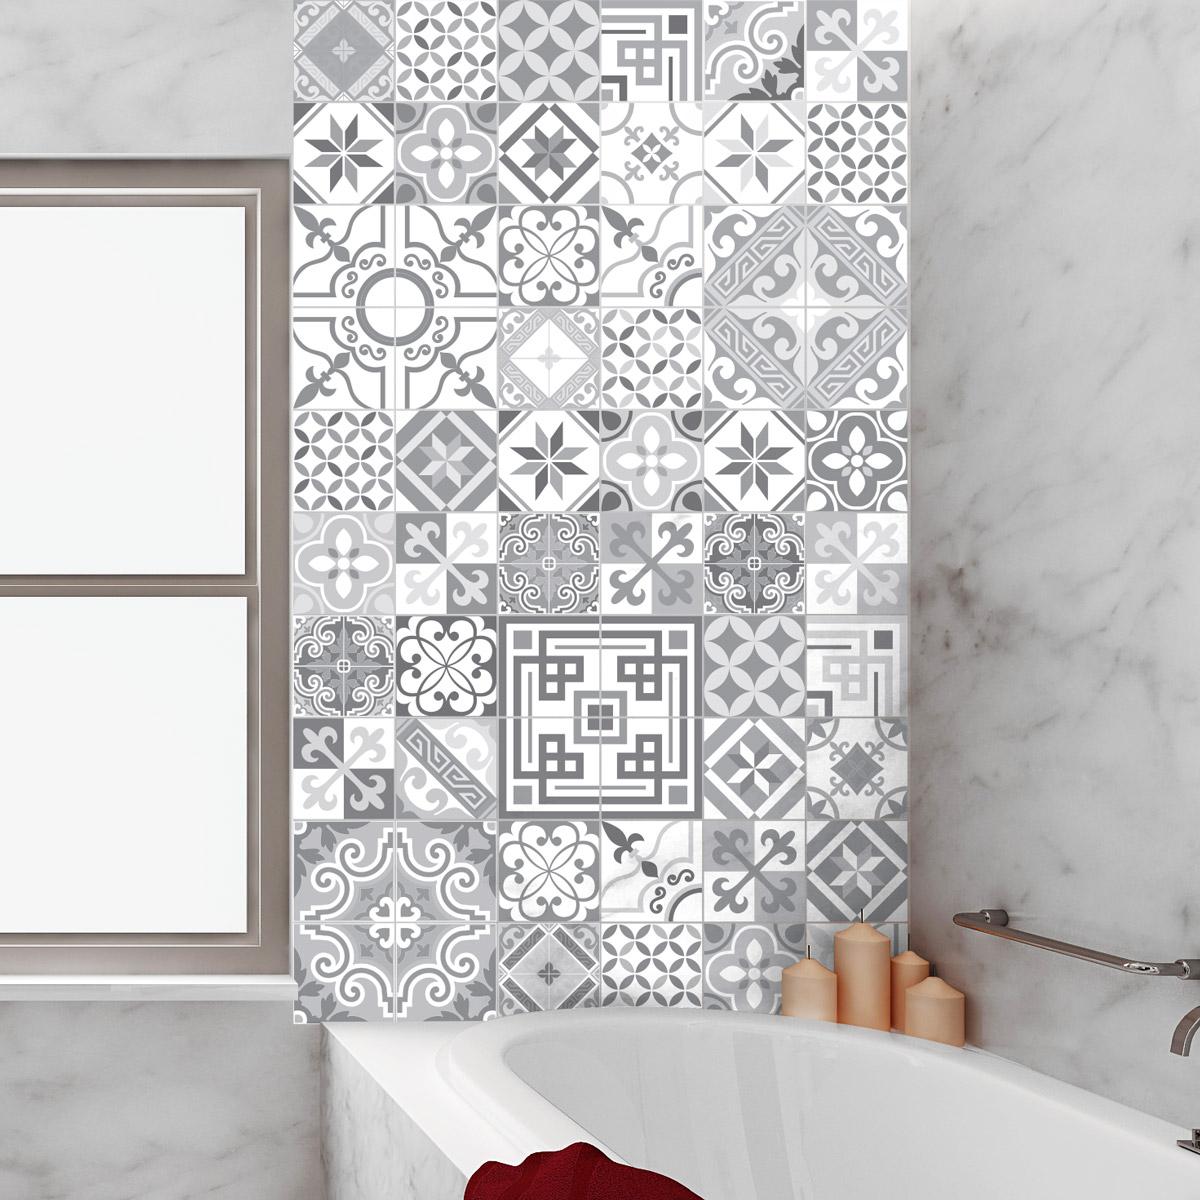 Carrelage Salle De Bain Irun ~ 60 stickers carrelages azulejos design vintage nuance de gris art